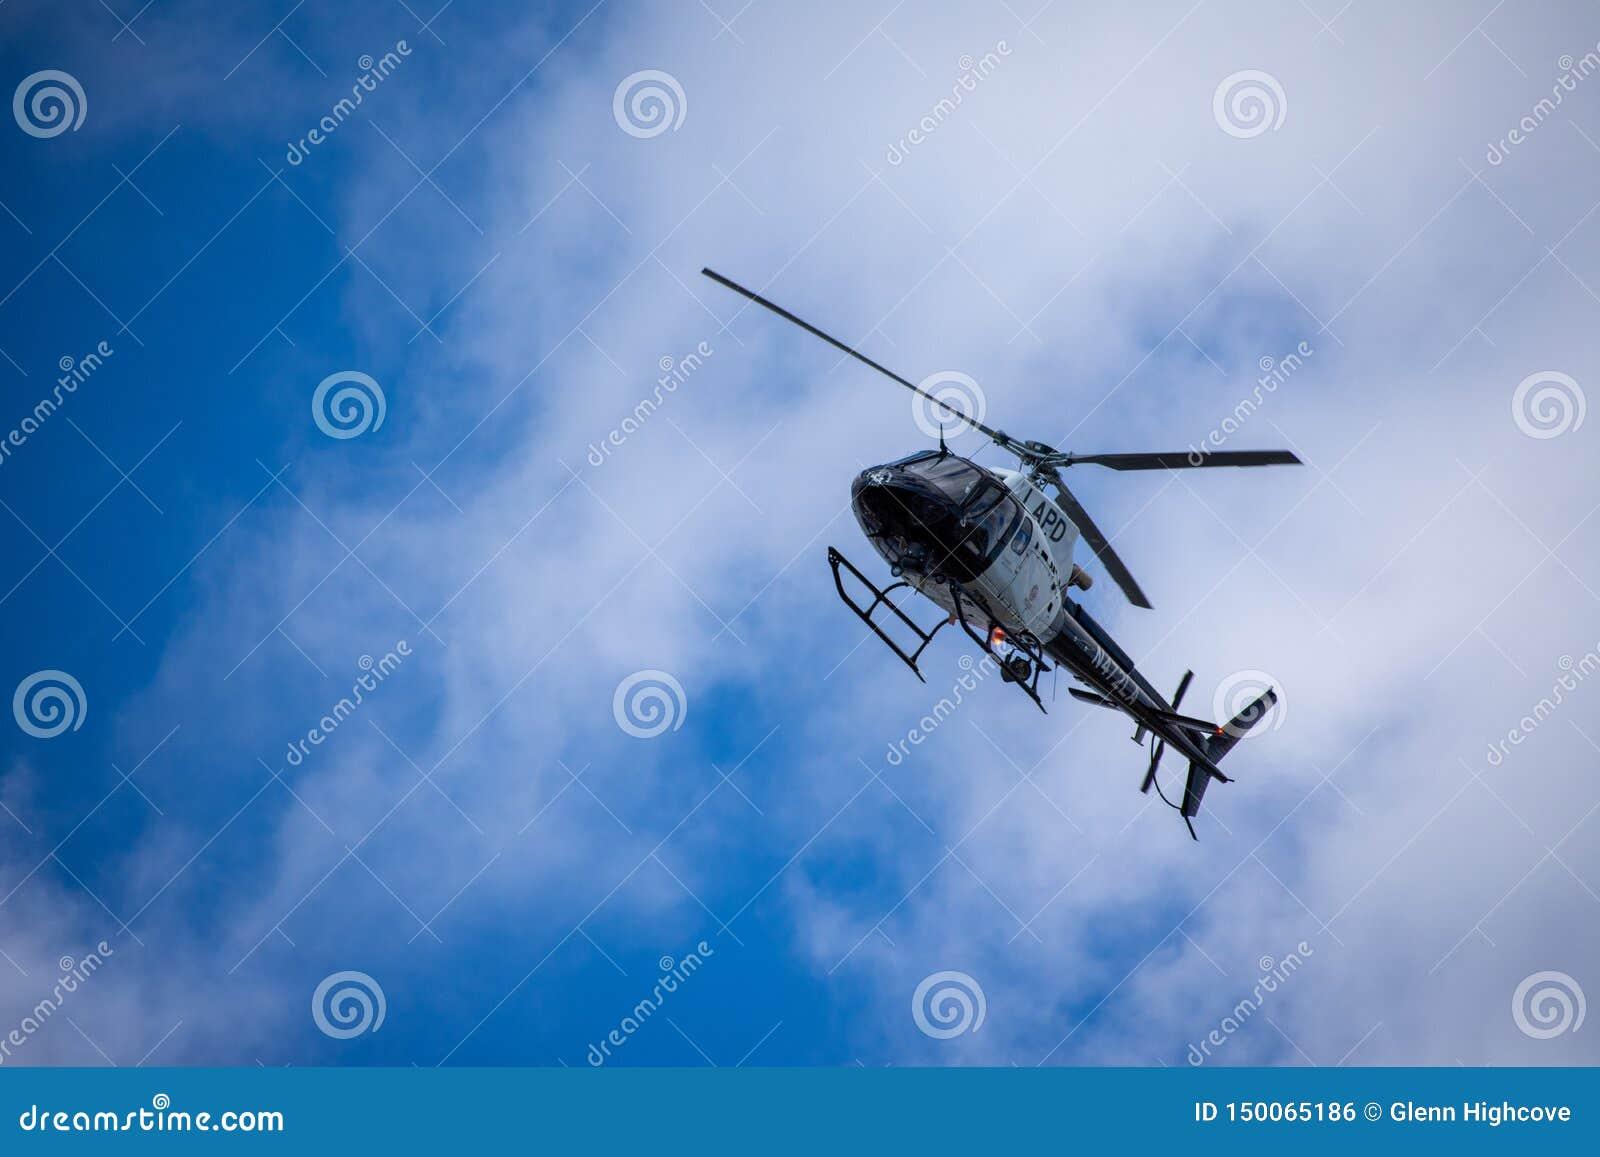 Northridge,加州/美国- 2019年5月27日:LAPD航空兵和巡逻单位反应在郊区的brandishing/ADW电话